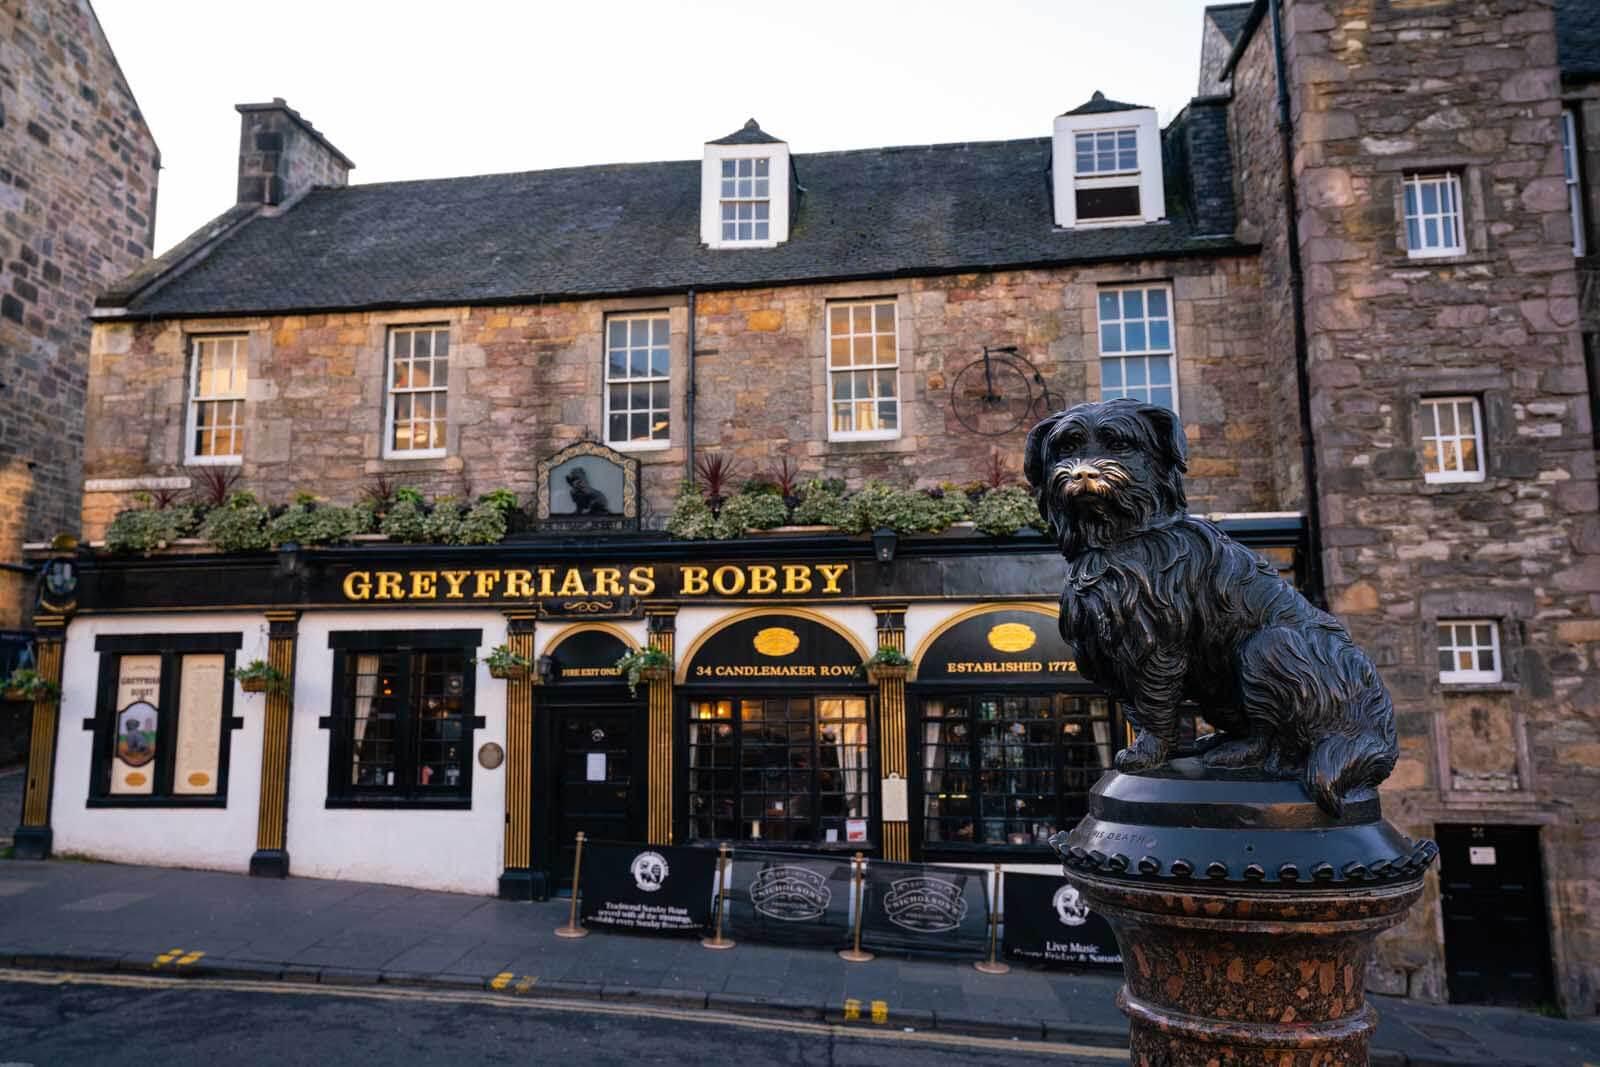 Greyfriars Bobby pub in Edinburgh